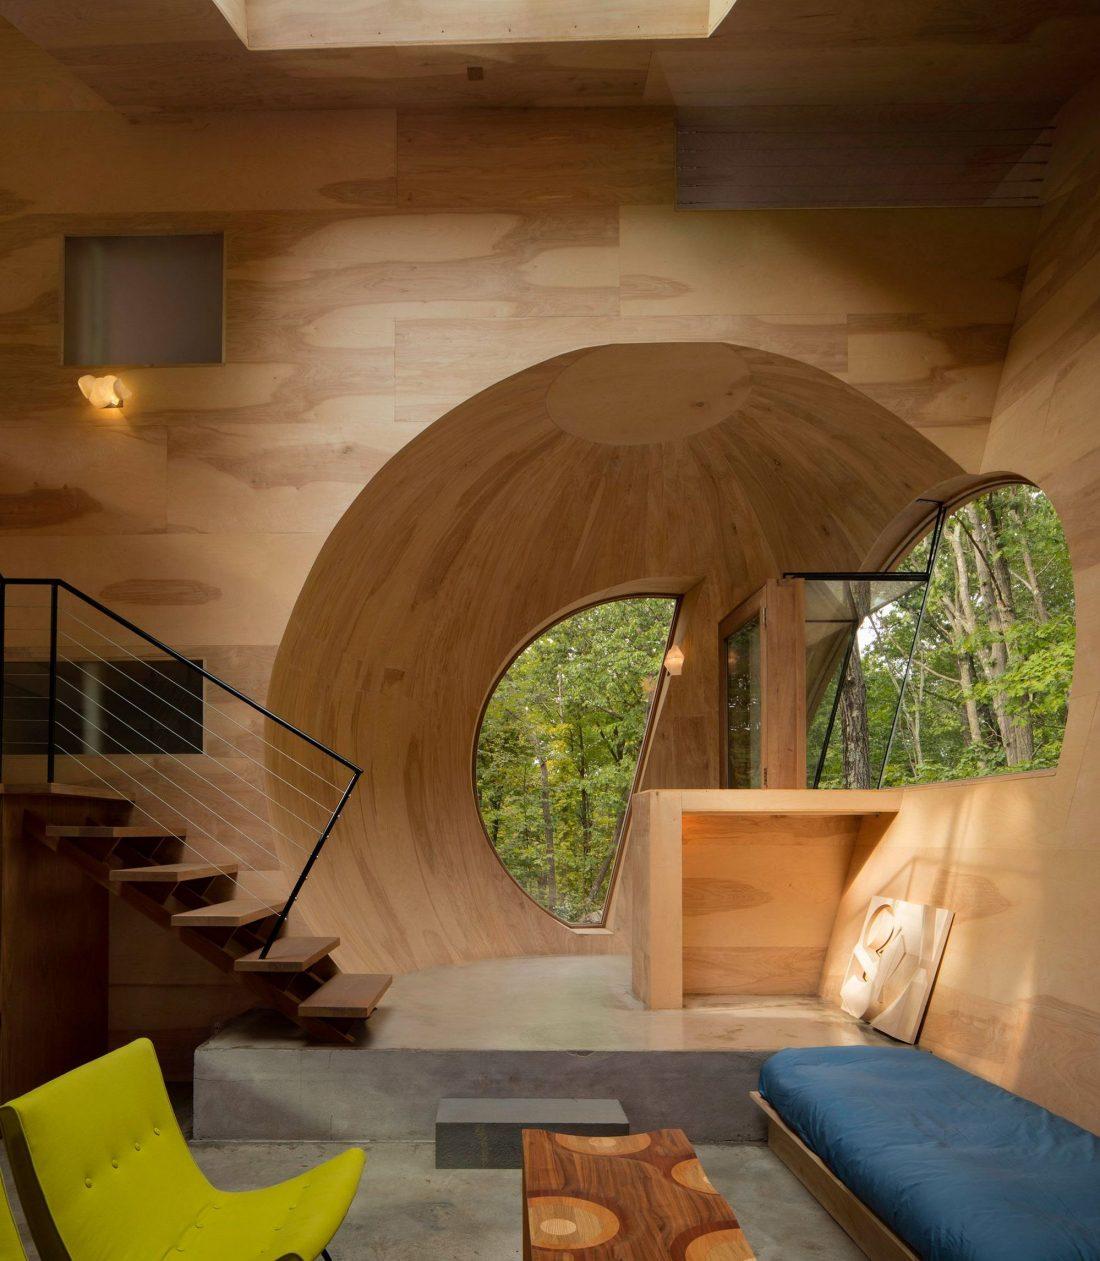 4d-gostevoj-dom-v-lesu-po-proektu-steven-holl-architects-23